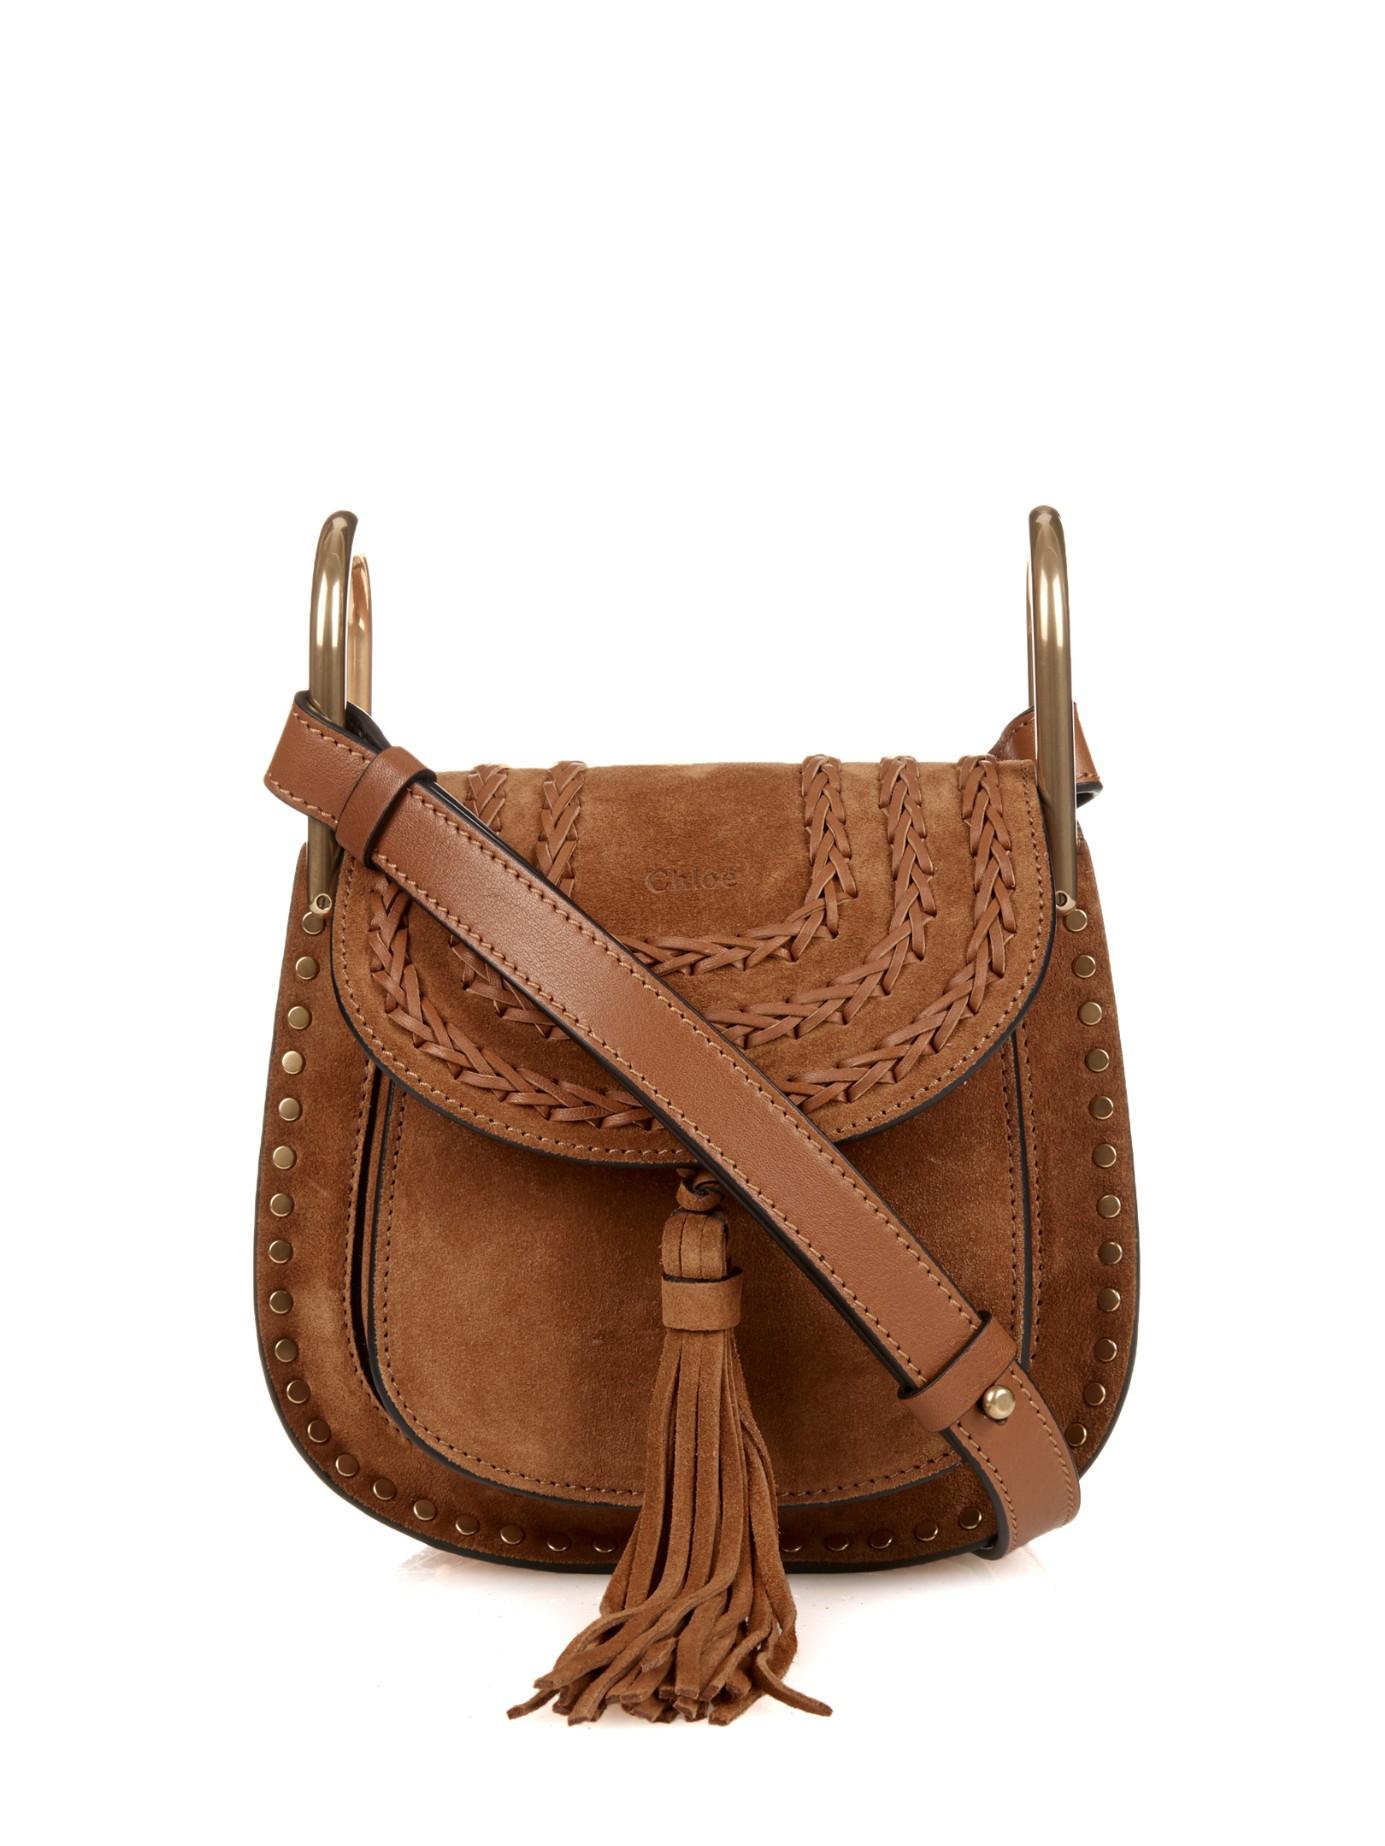 75457b418c66f Chloé Hudson Mini Suede Cross-Body Bag in Brown - Lyst